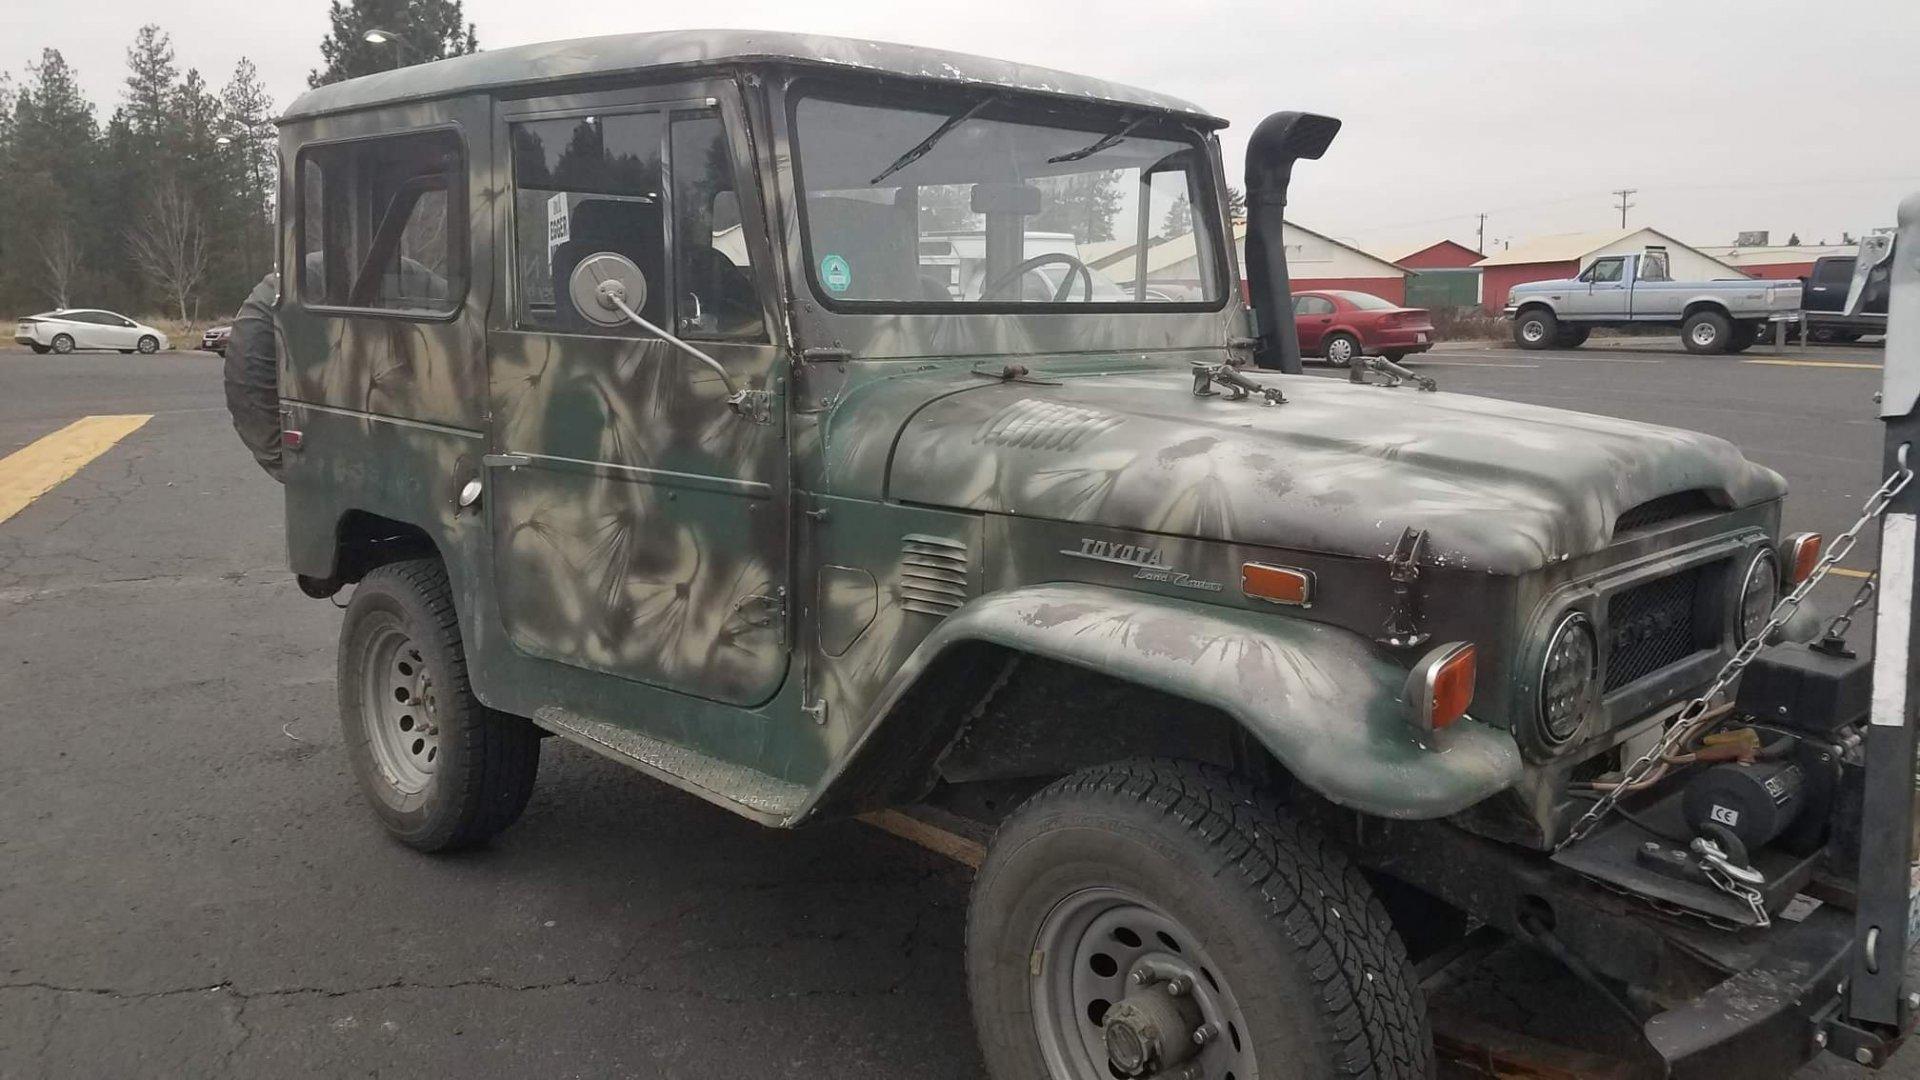 craigslist - Not mine, Spokane. WA '72. $6,500   IH8MUD Forum